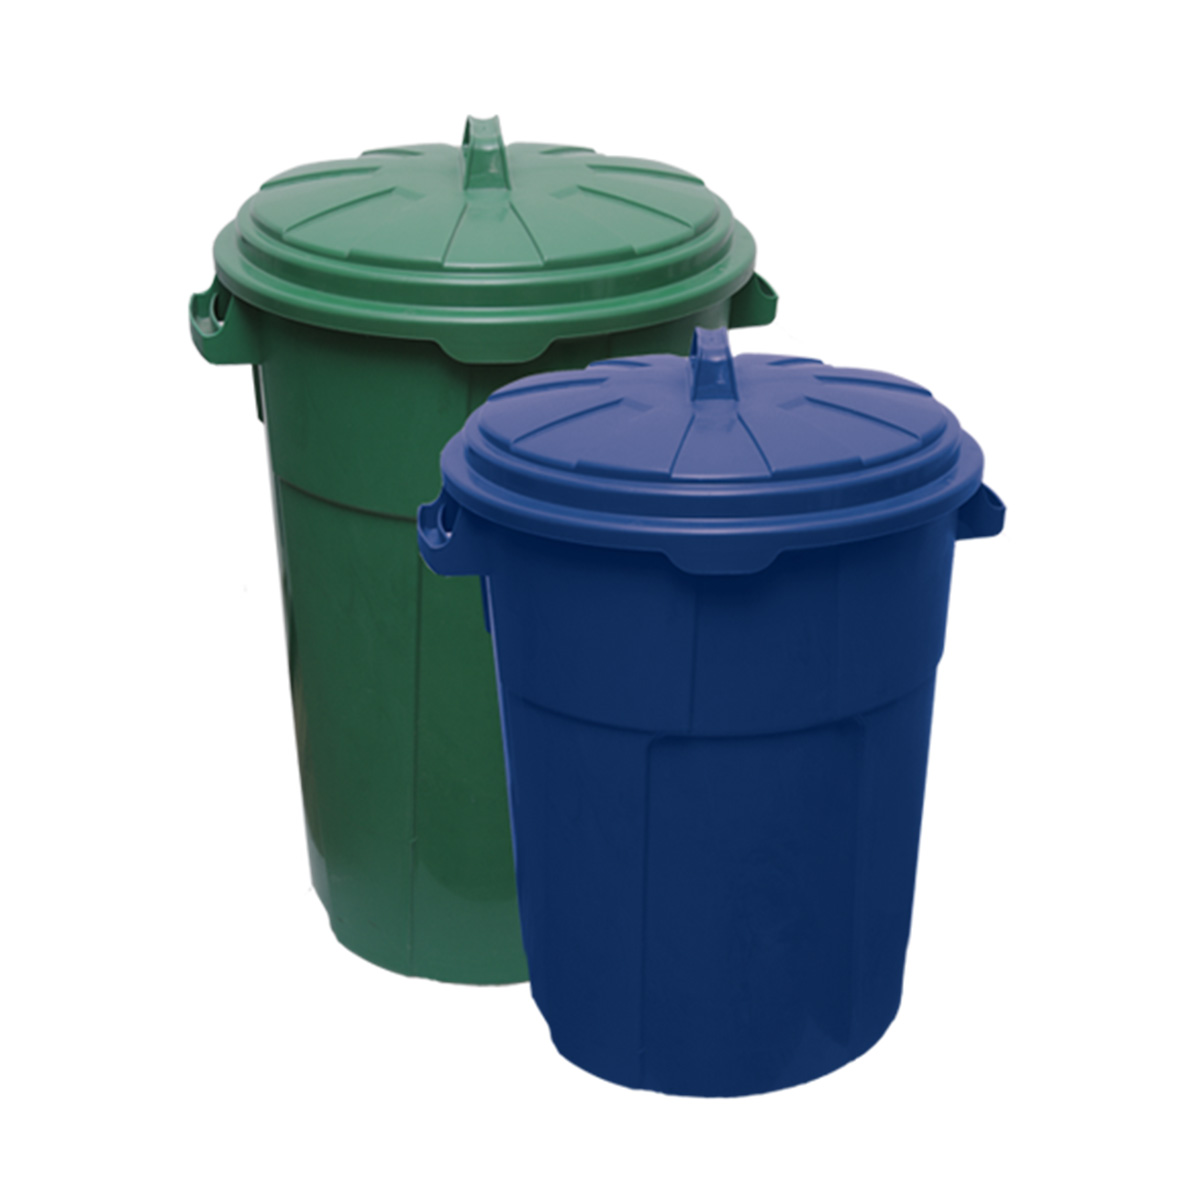 Abfallbehälter Duo